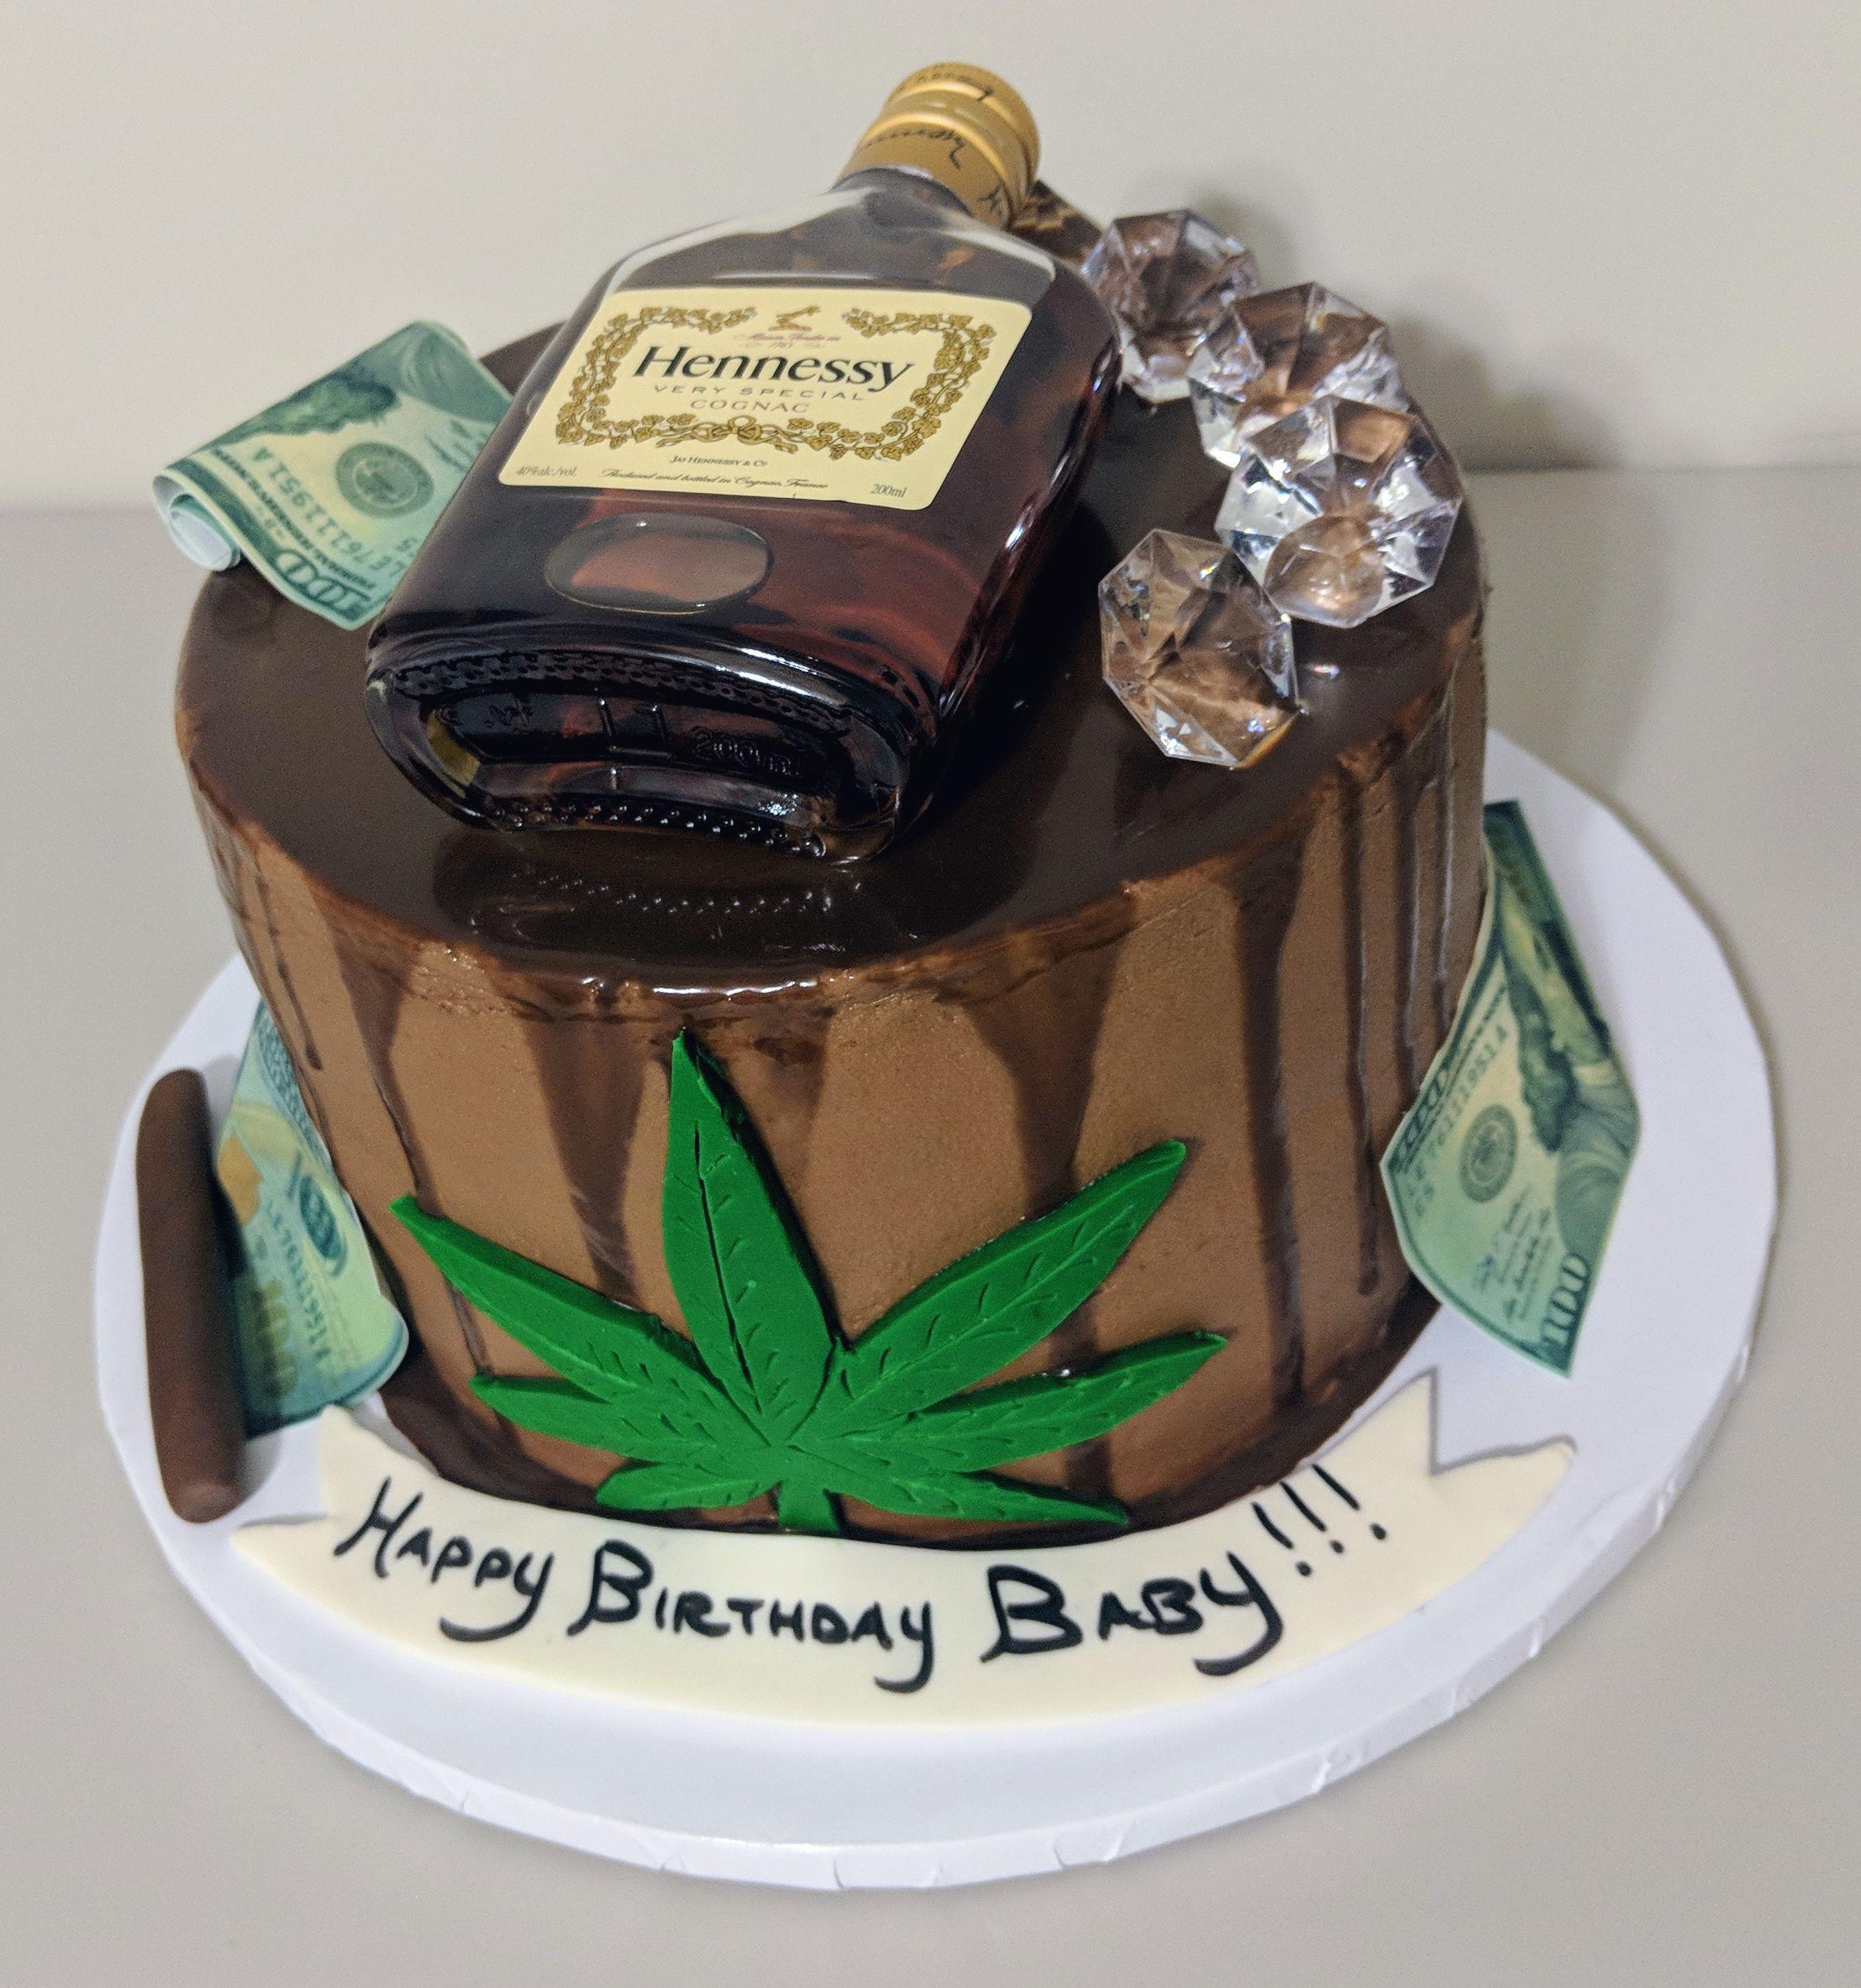 Mary Jane & Friends Birthday Cake